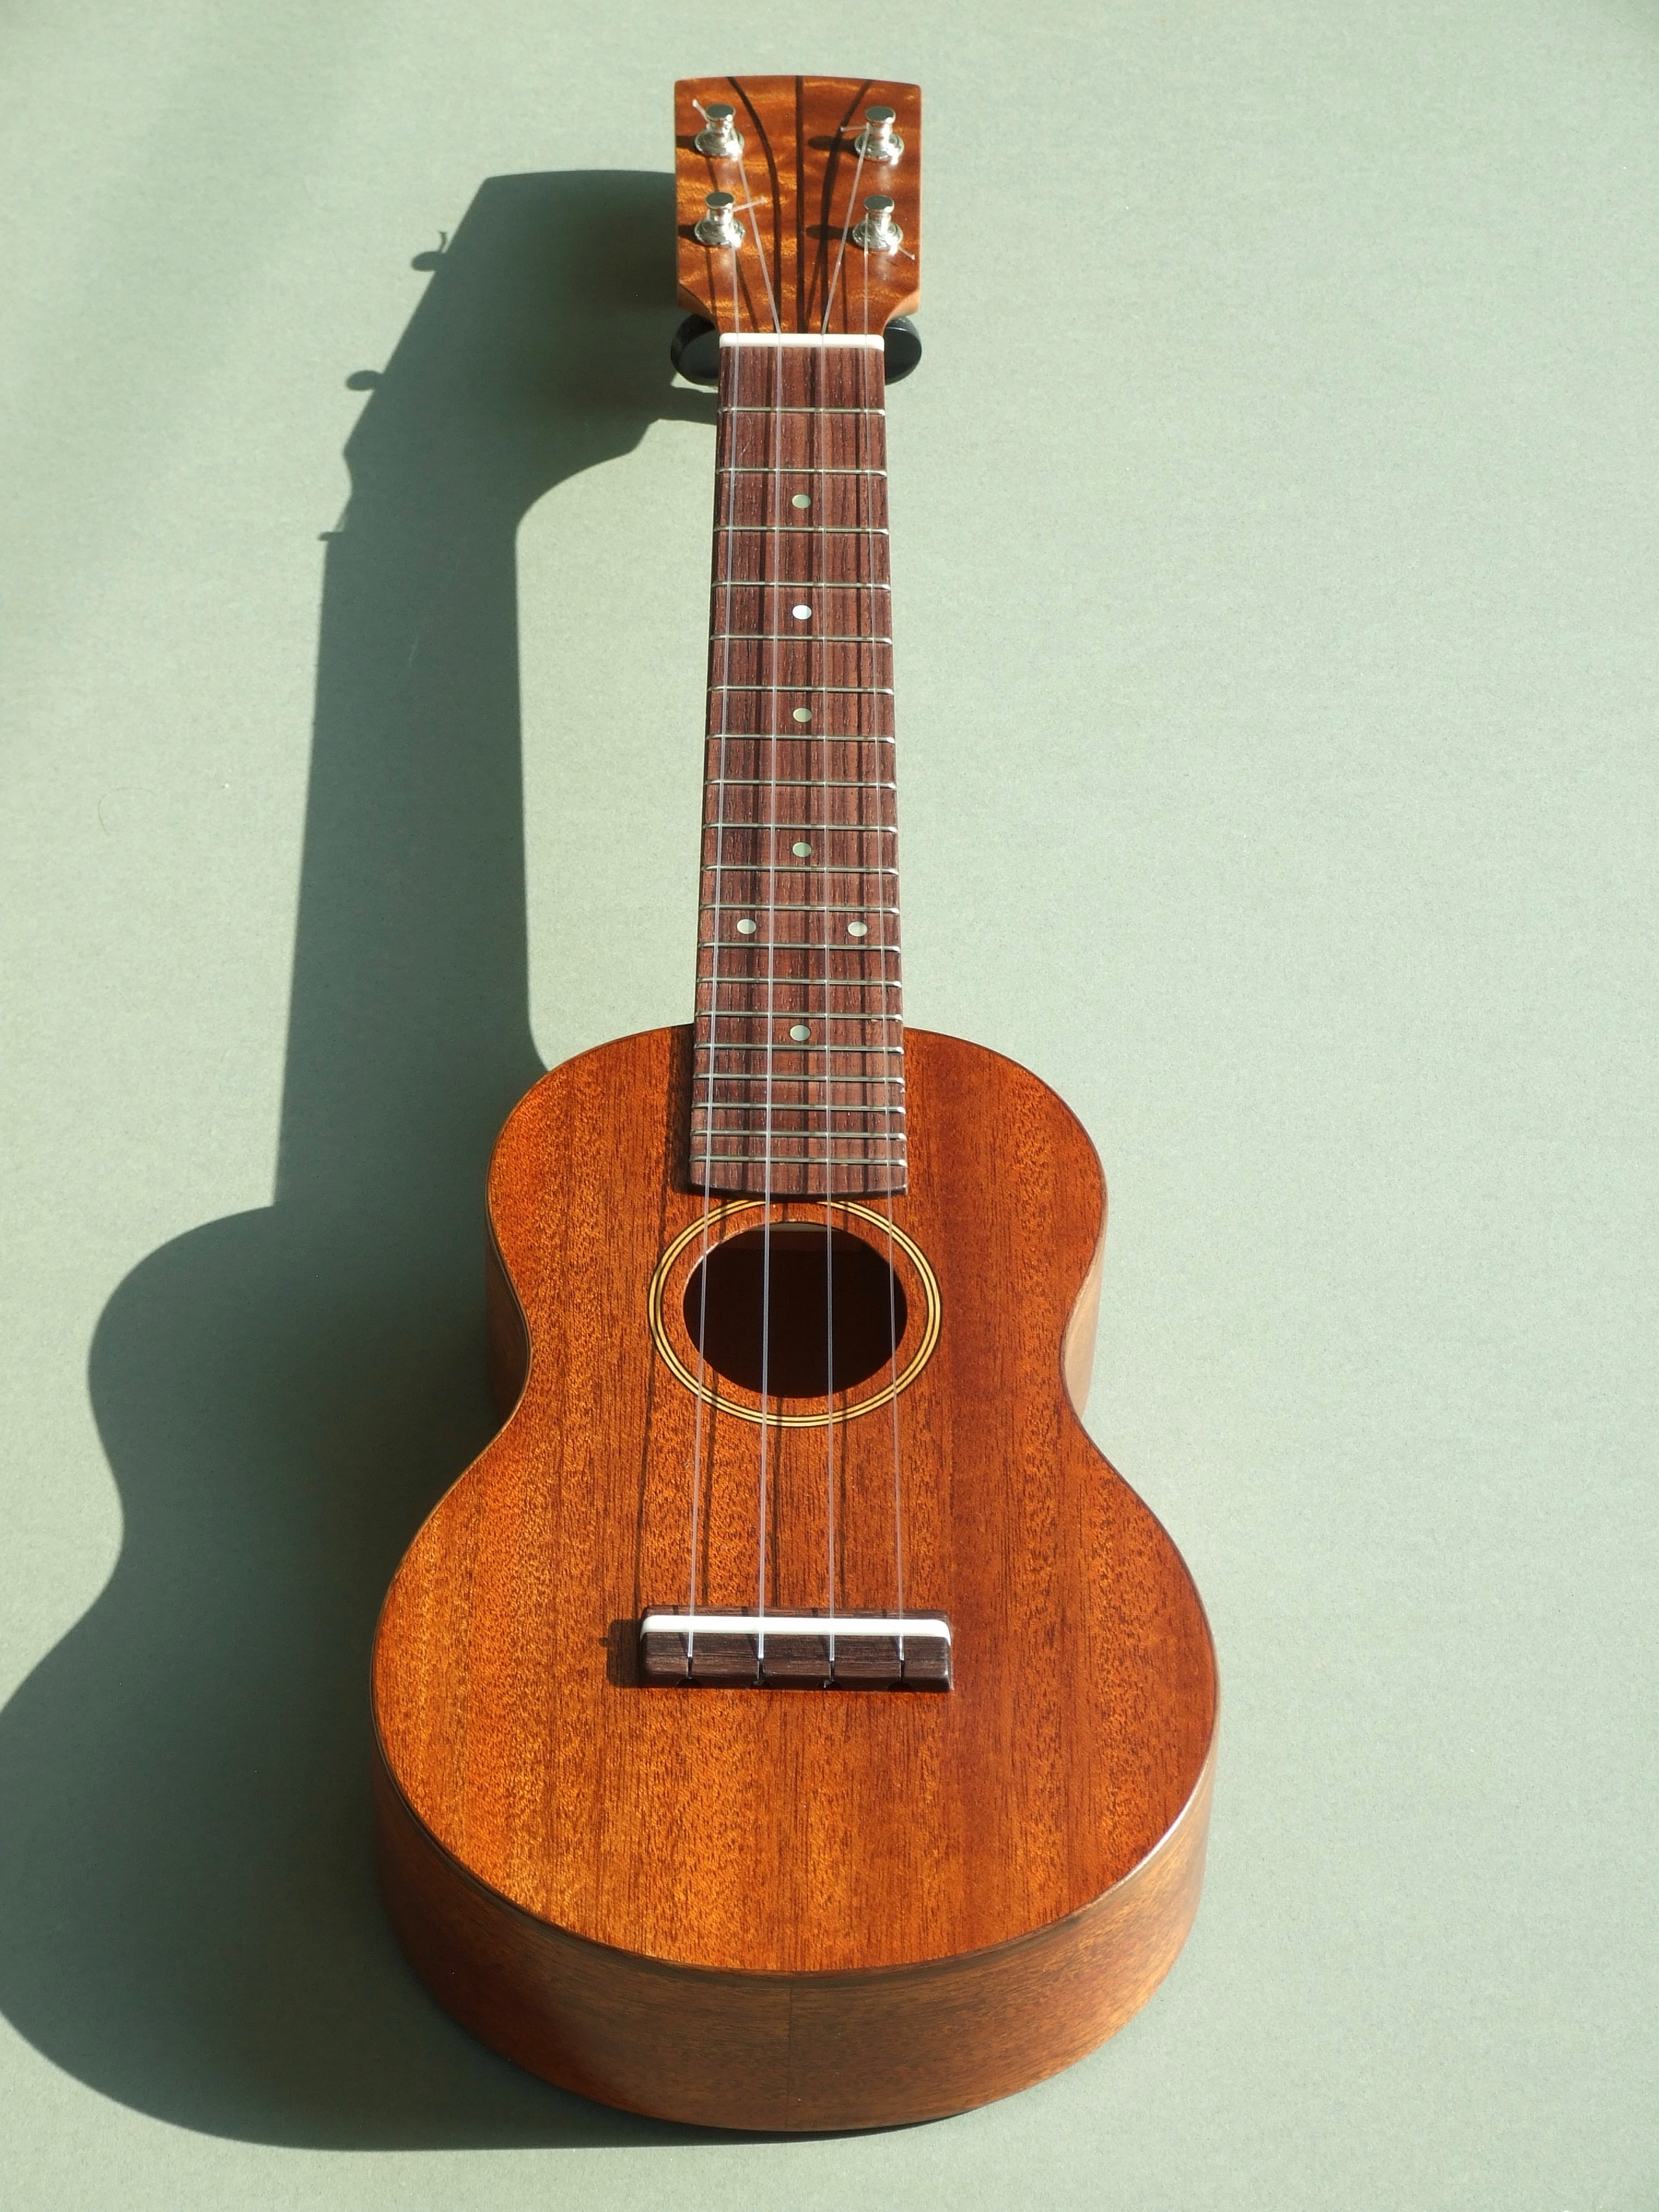 dj morgan ukuleles handmade in england. Black Bedroom Furniture Sets. Home Design Ideas